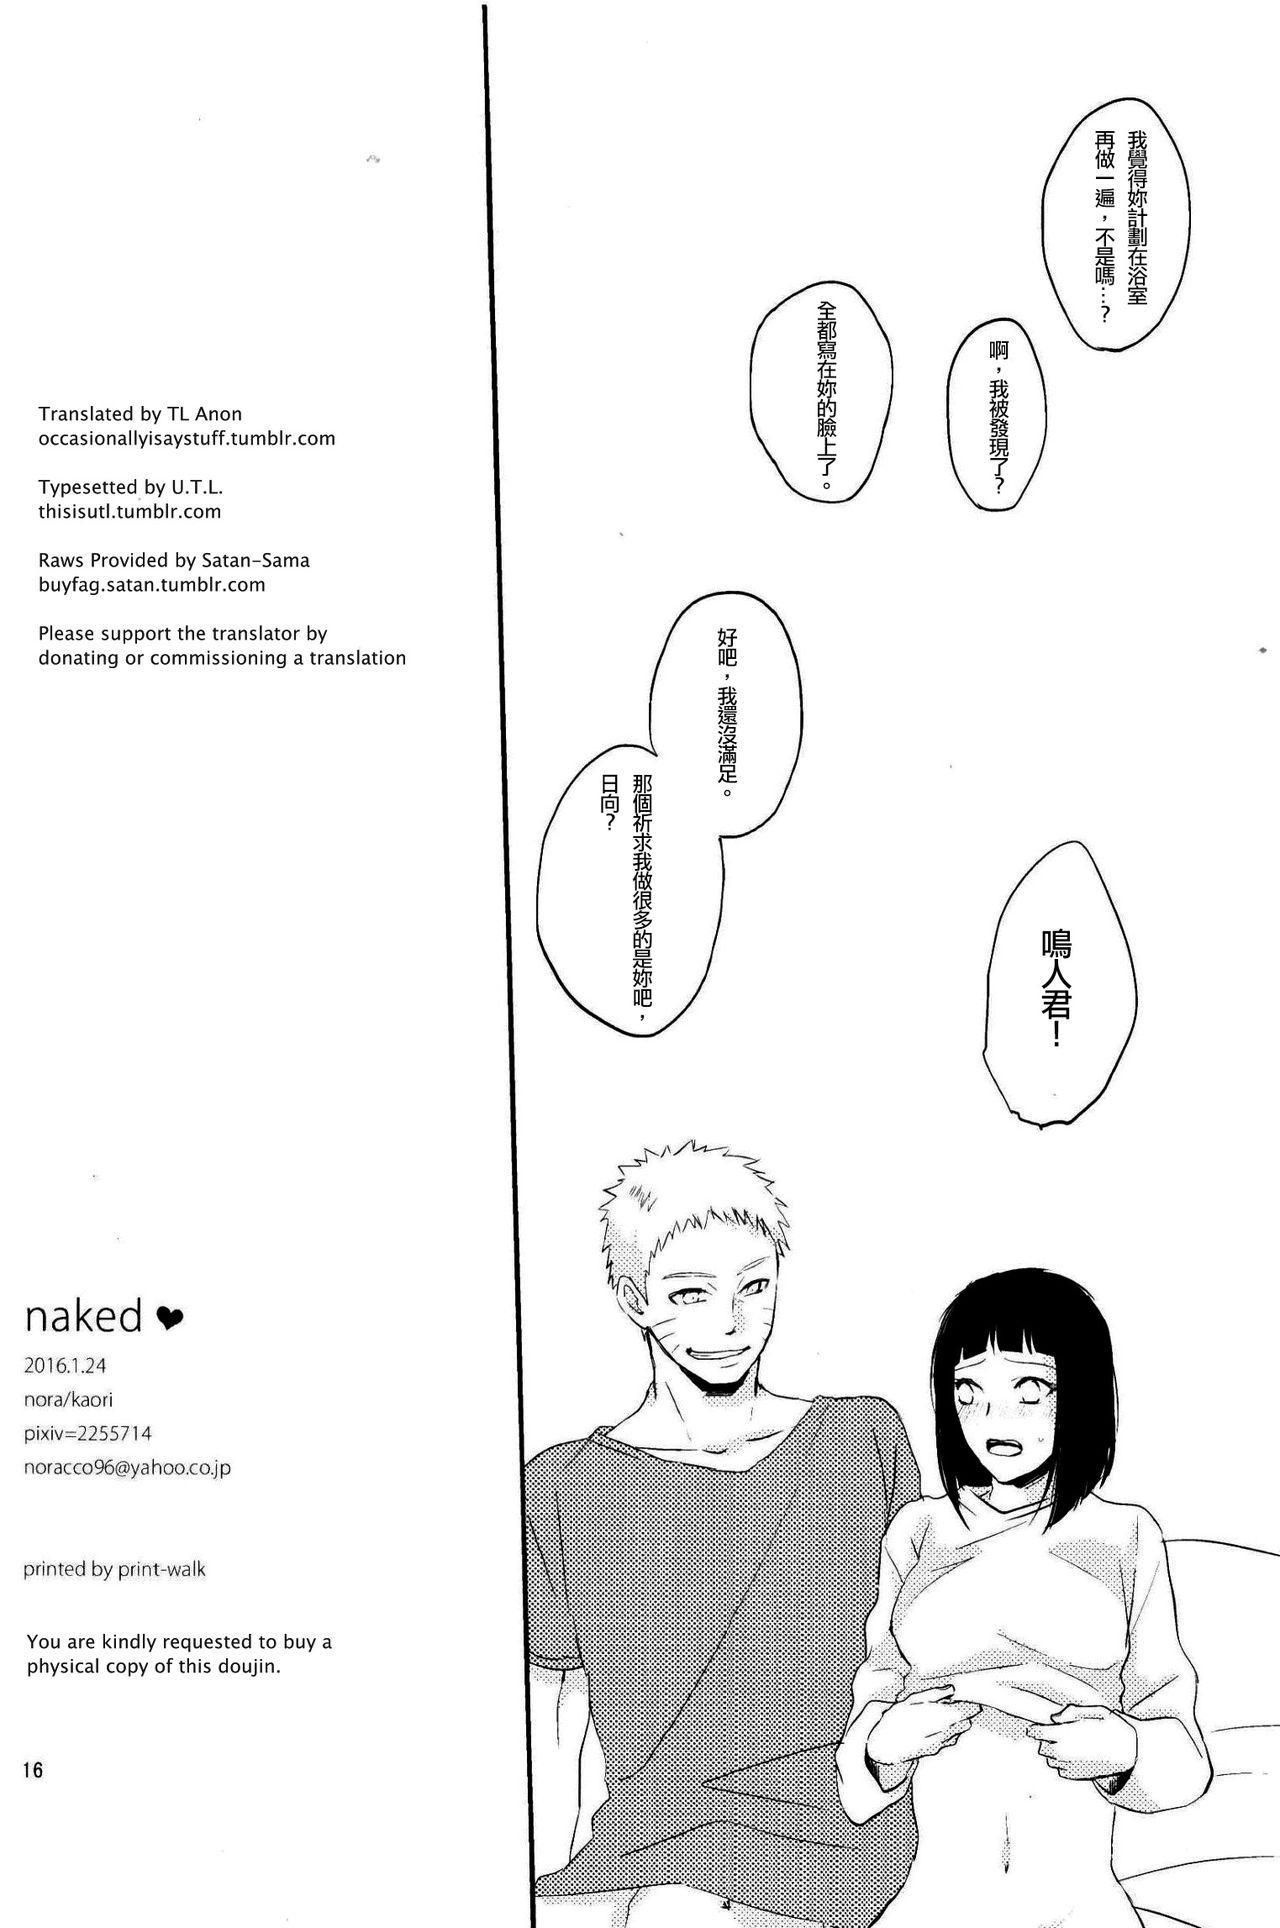 Naked 16